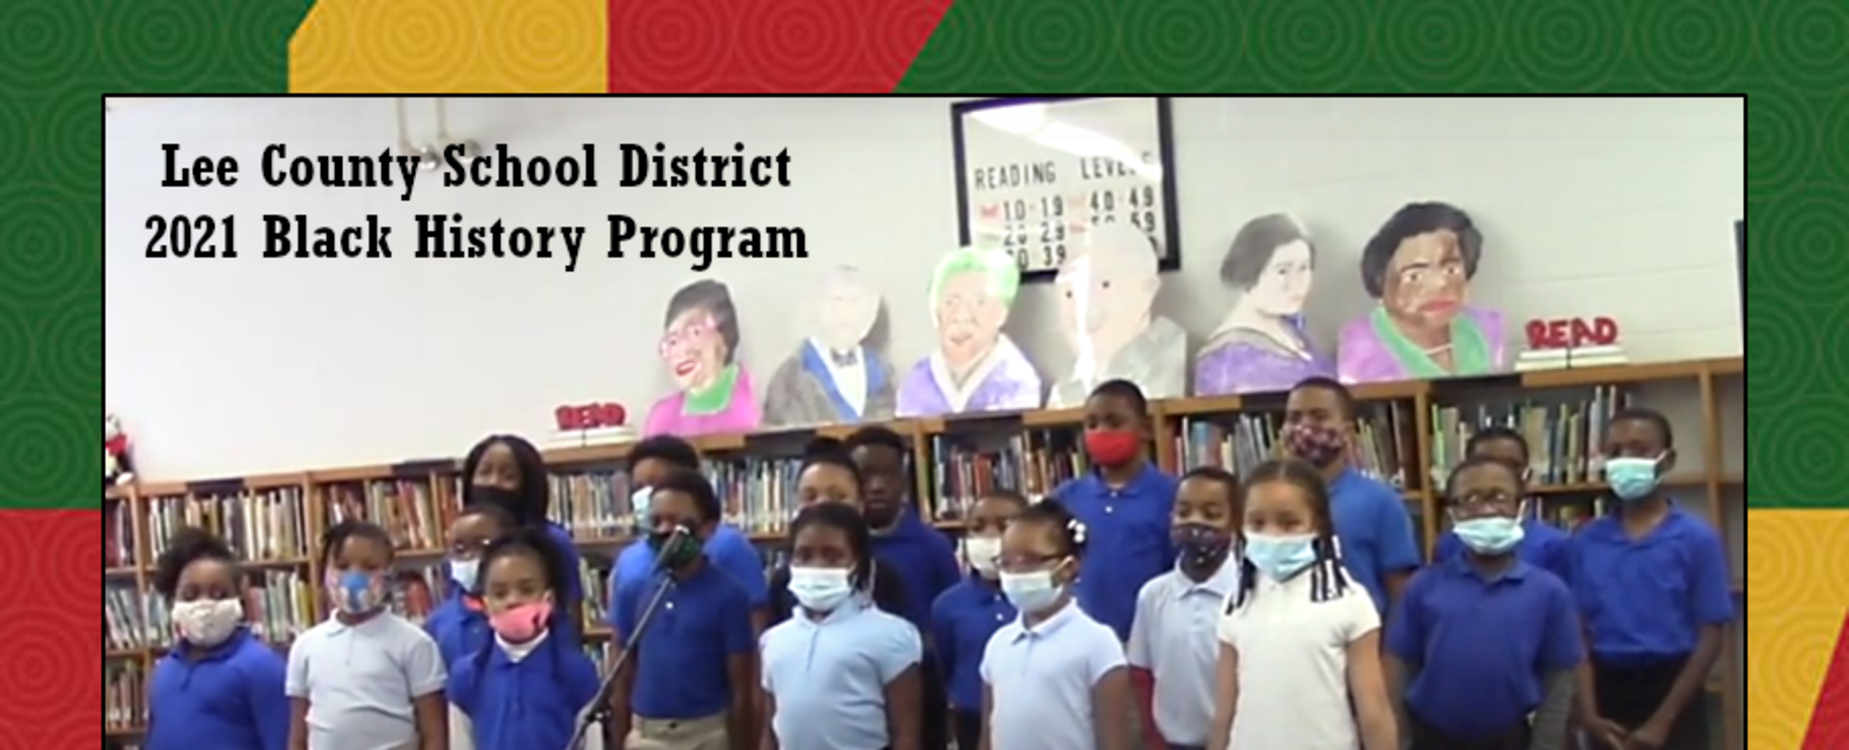 2021 District Black History Program